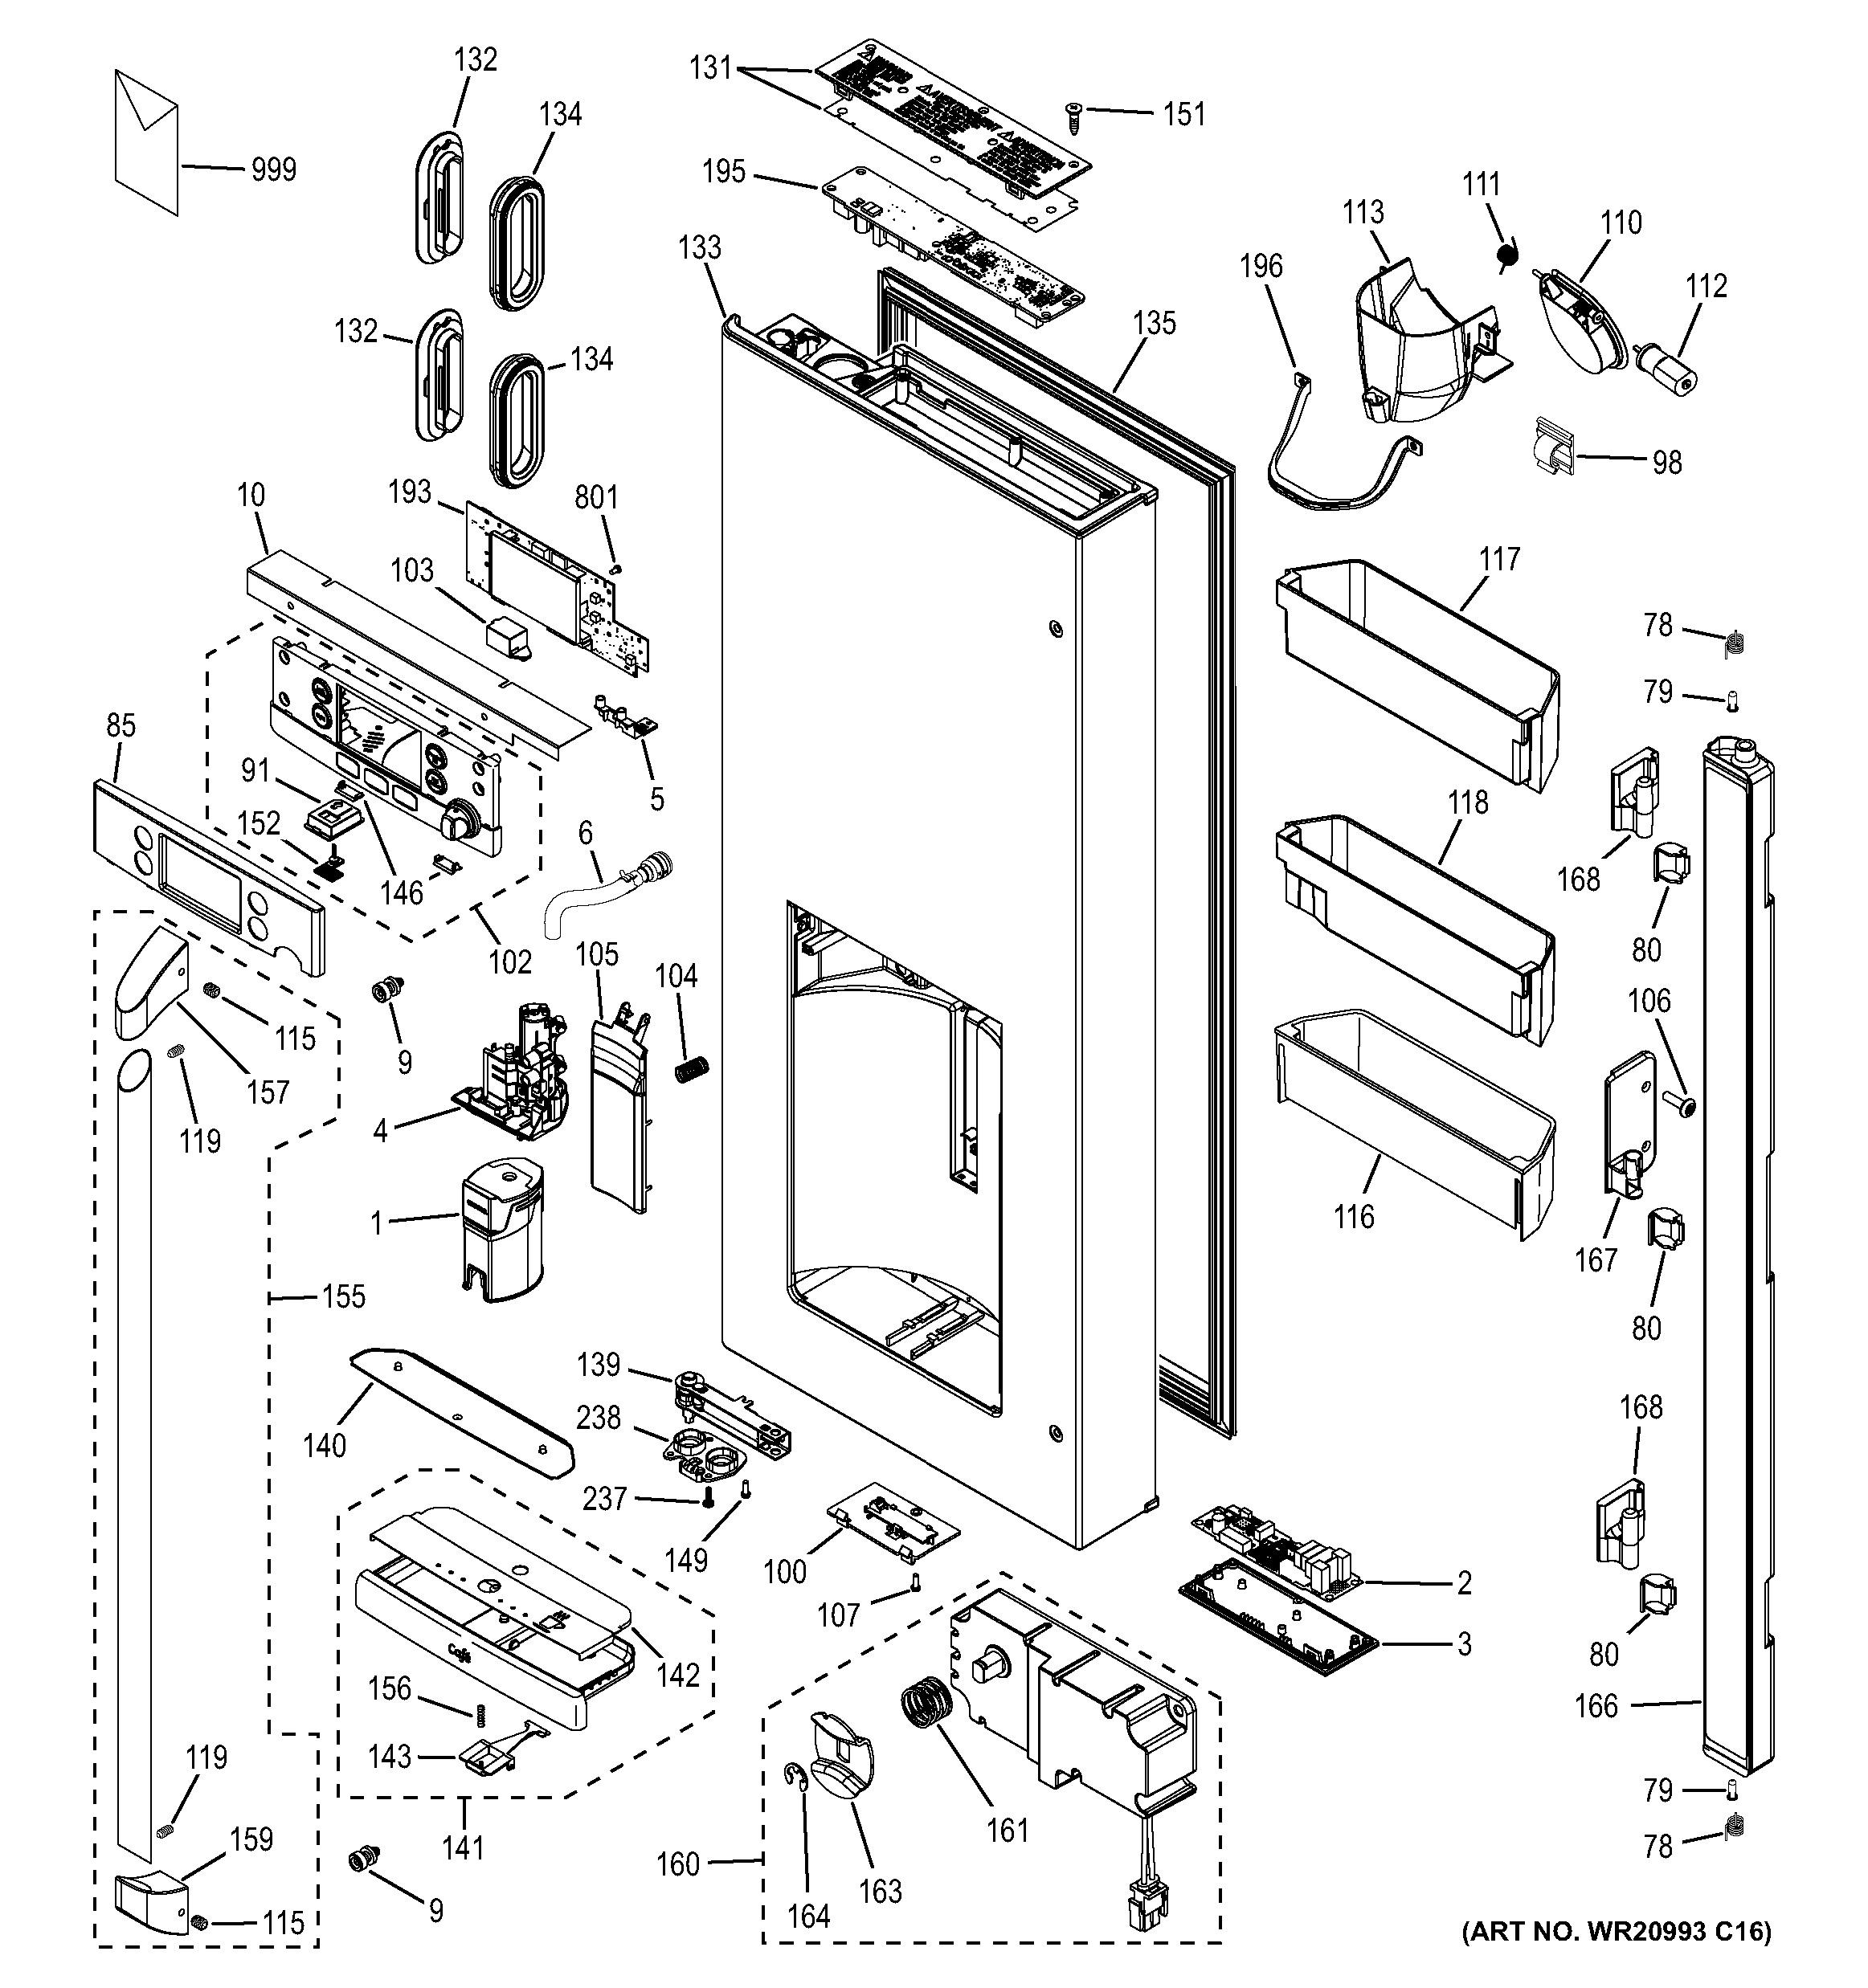 Assembly View For Dispenser Door